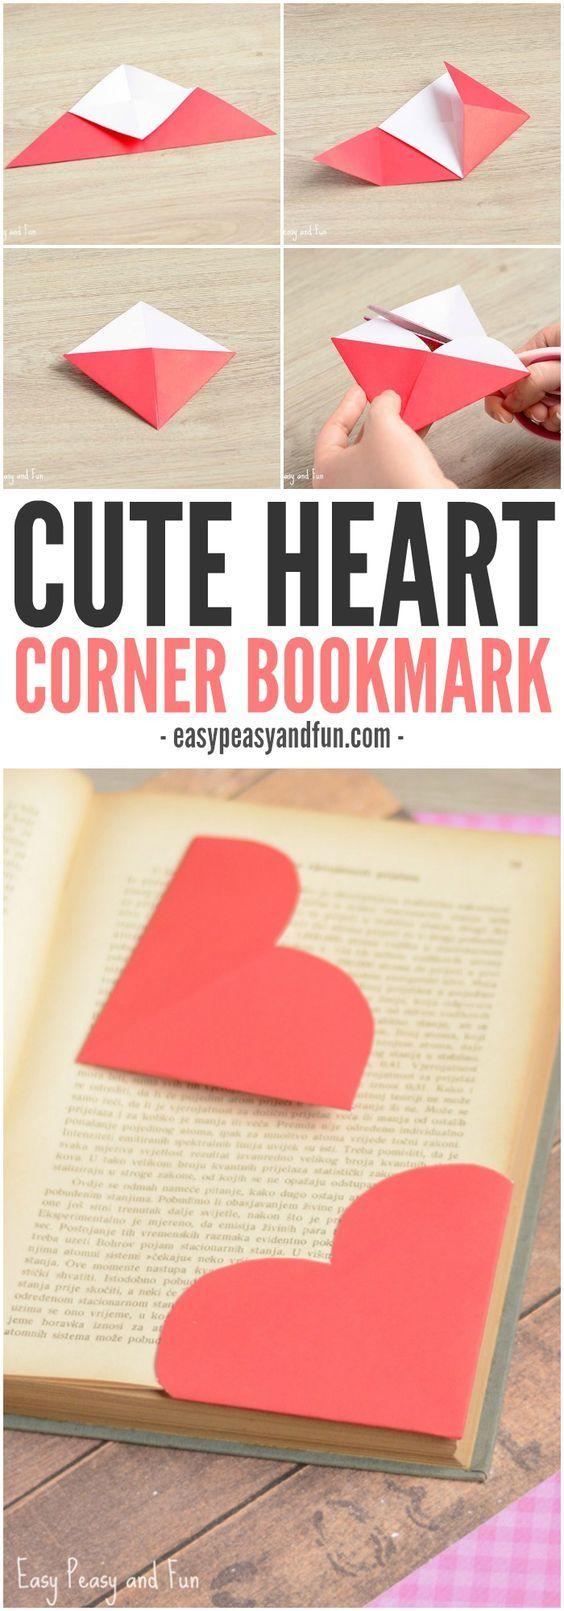 Bookmark ideas Heart Corner Bookmarks Heart